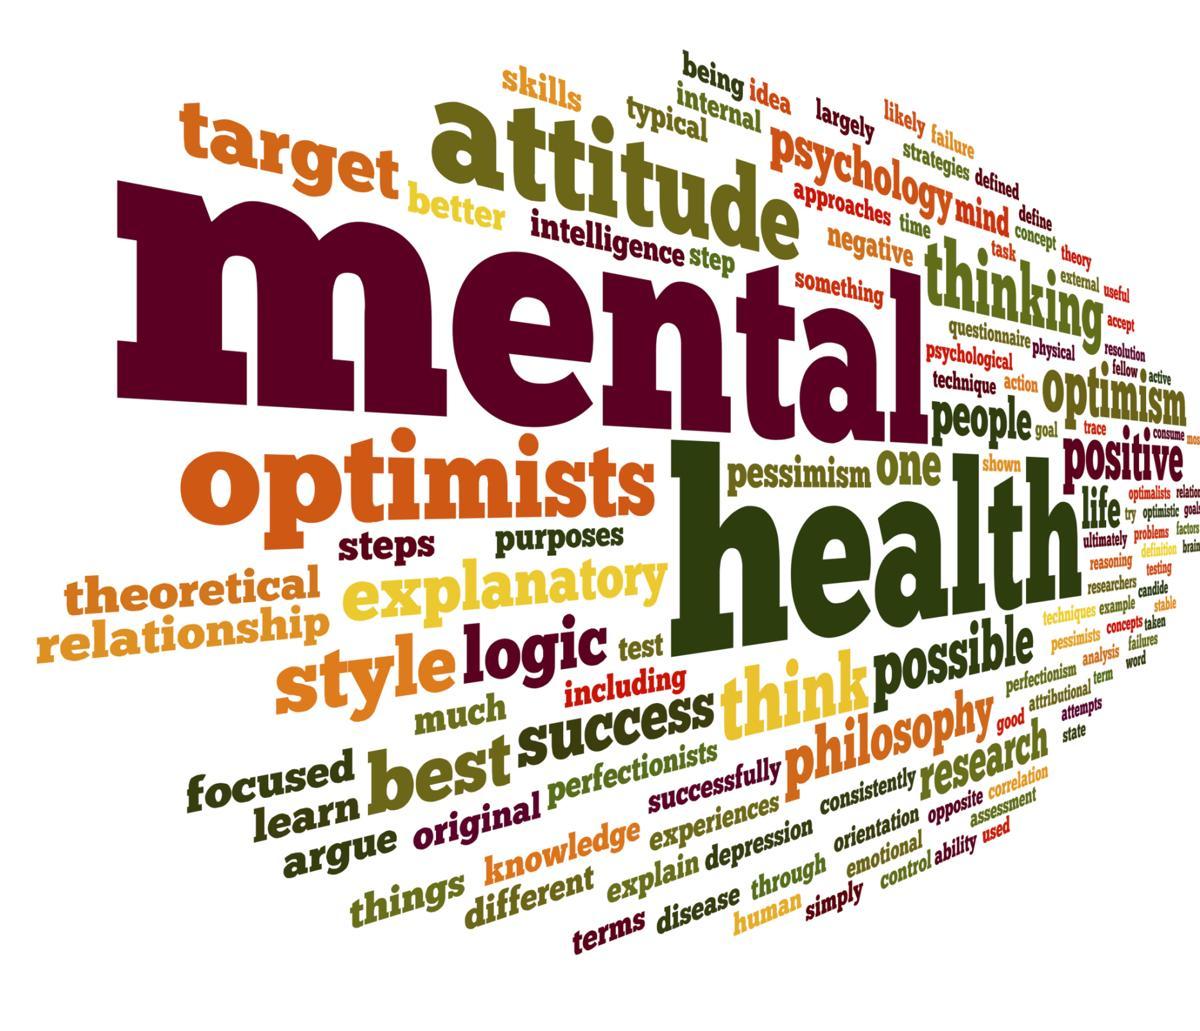 Mentally Healthy Shabbat, March 15-16, 2019